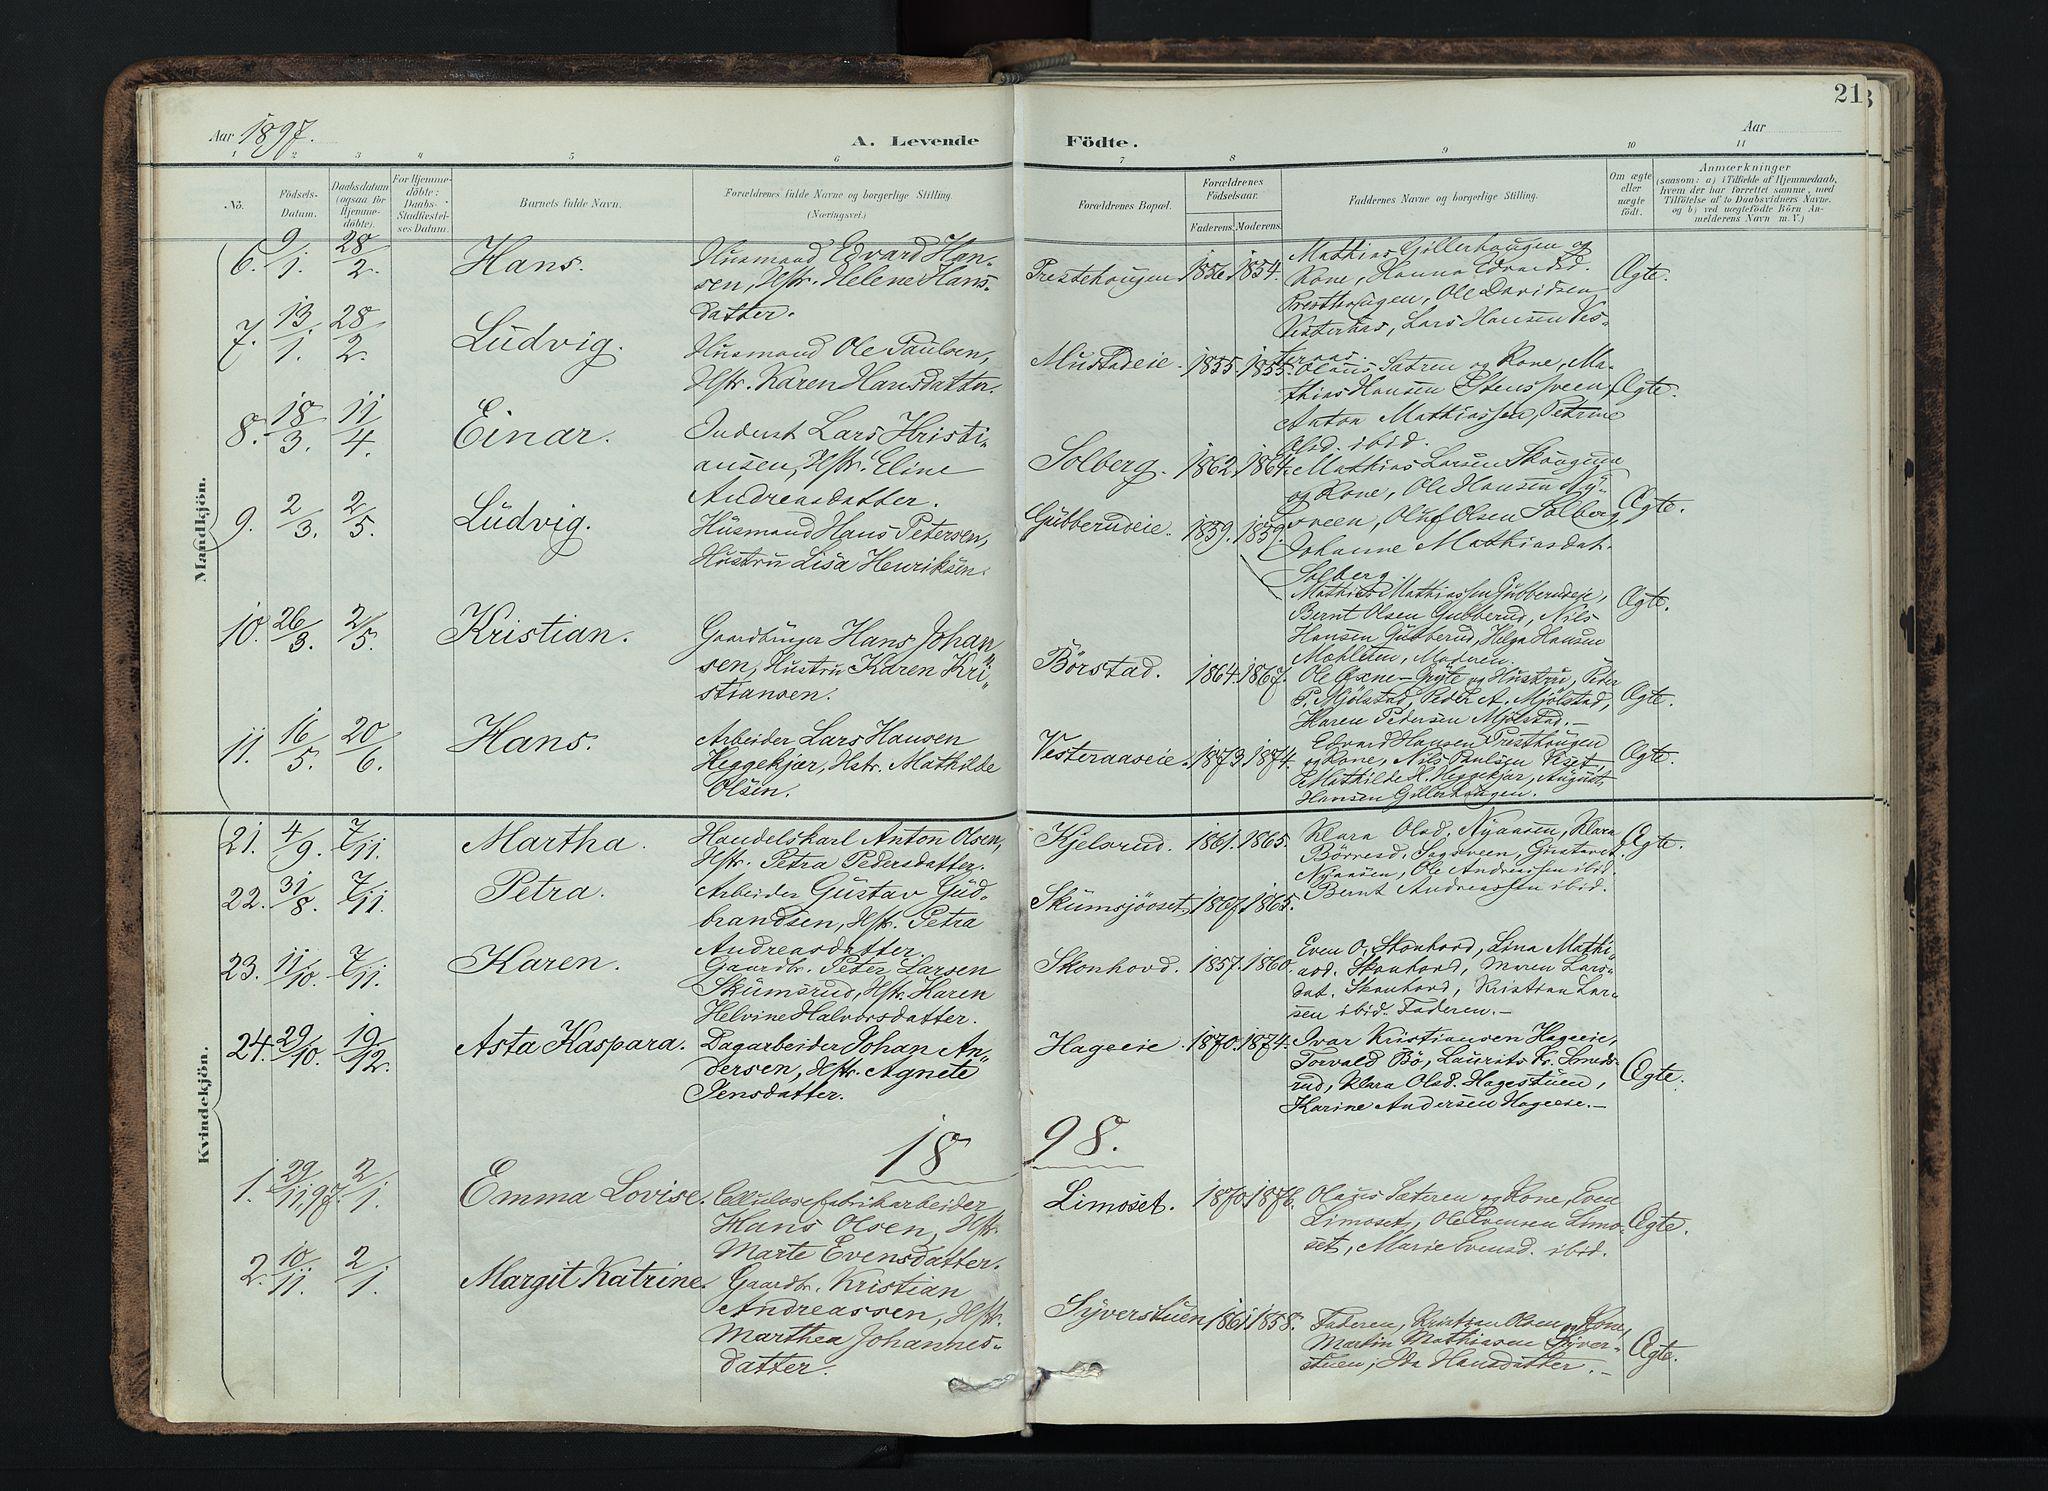 SAH, Vardal prestekontor, H/Ha/Haa/L0019: Ministerialbok nr. 19, 1893-1907, s. 21